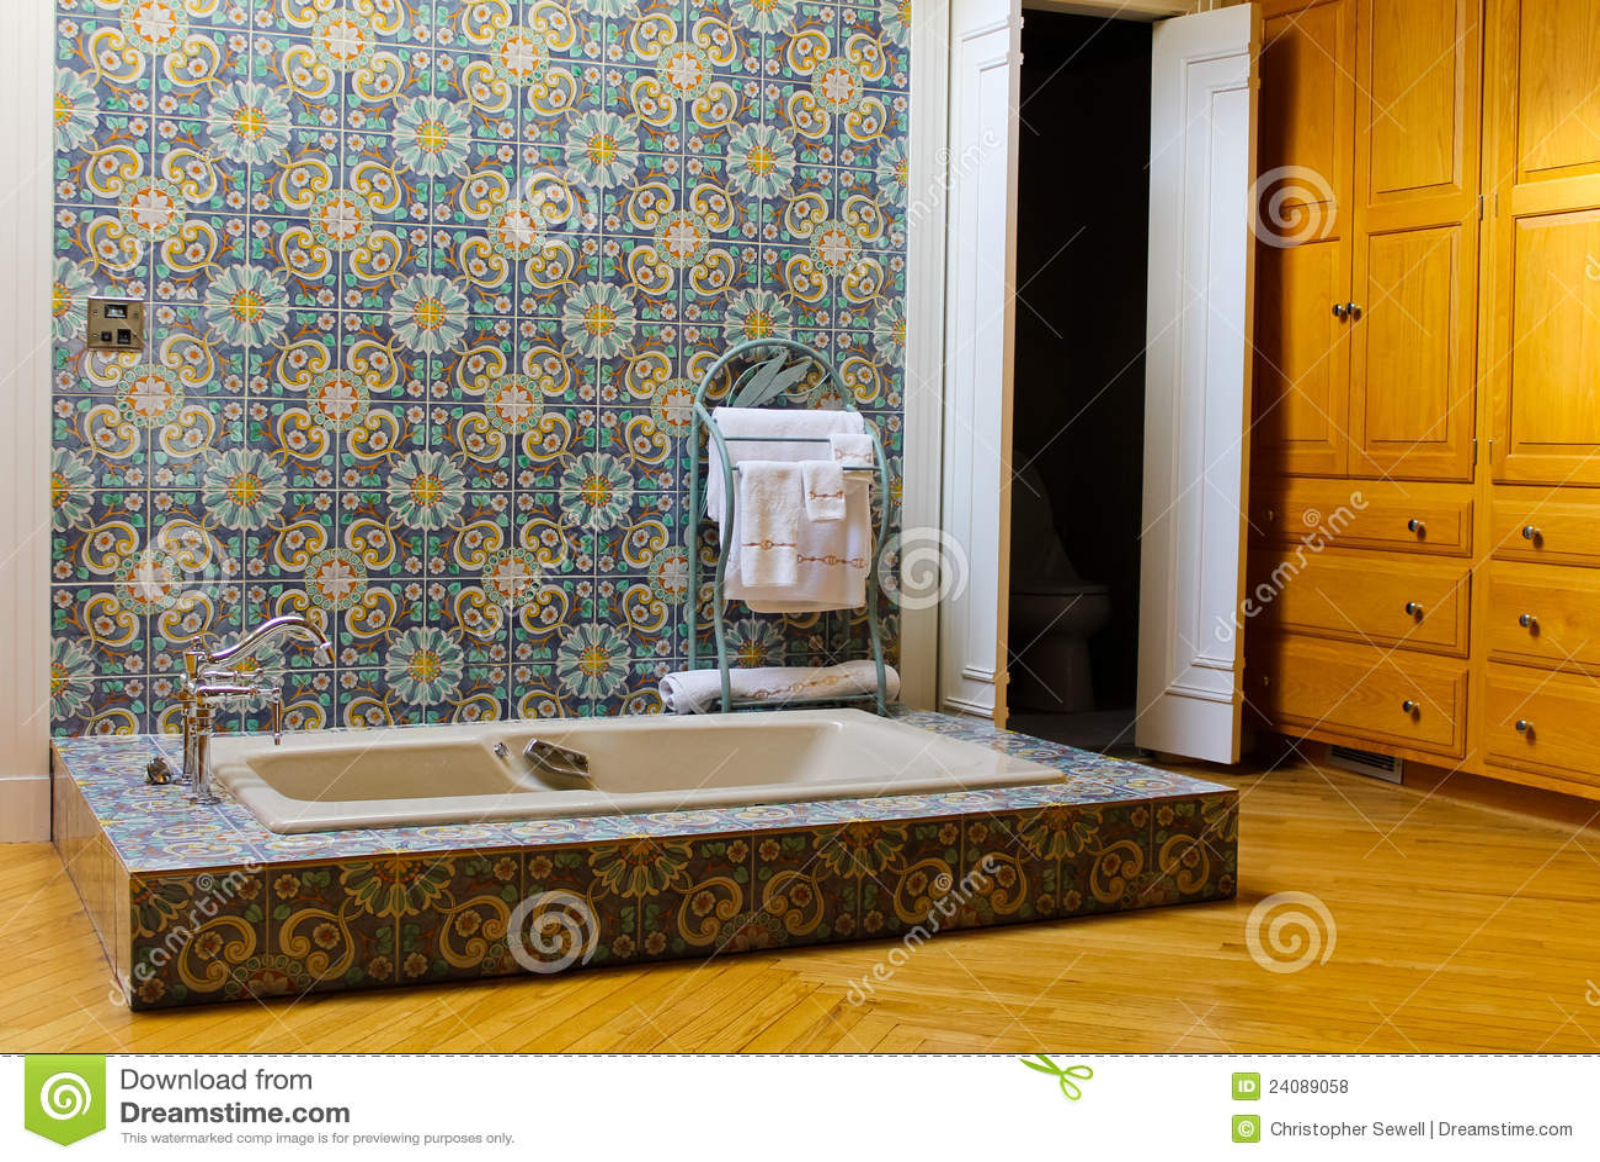 rustikale badezimmer szene lizenzfreie stockfotos bild. Black Bedroom Furniture Sets. Home Design Ideas